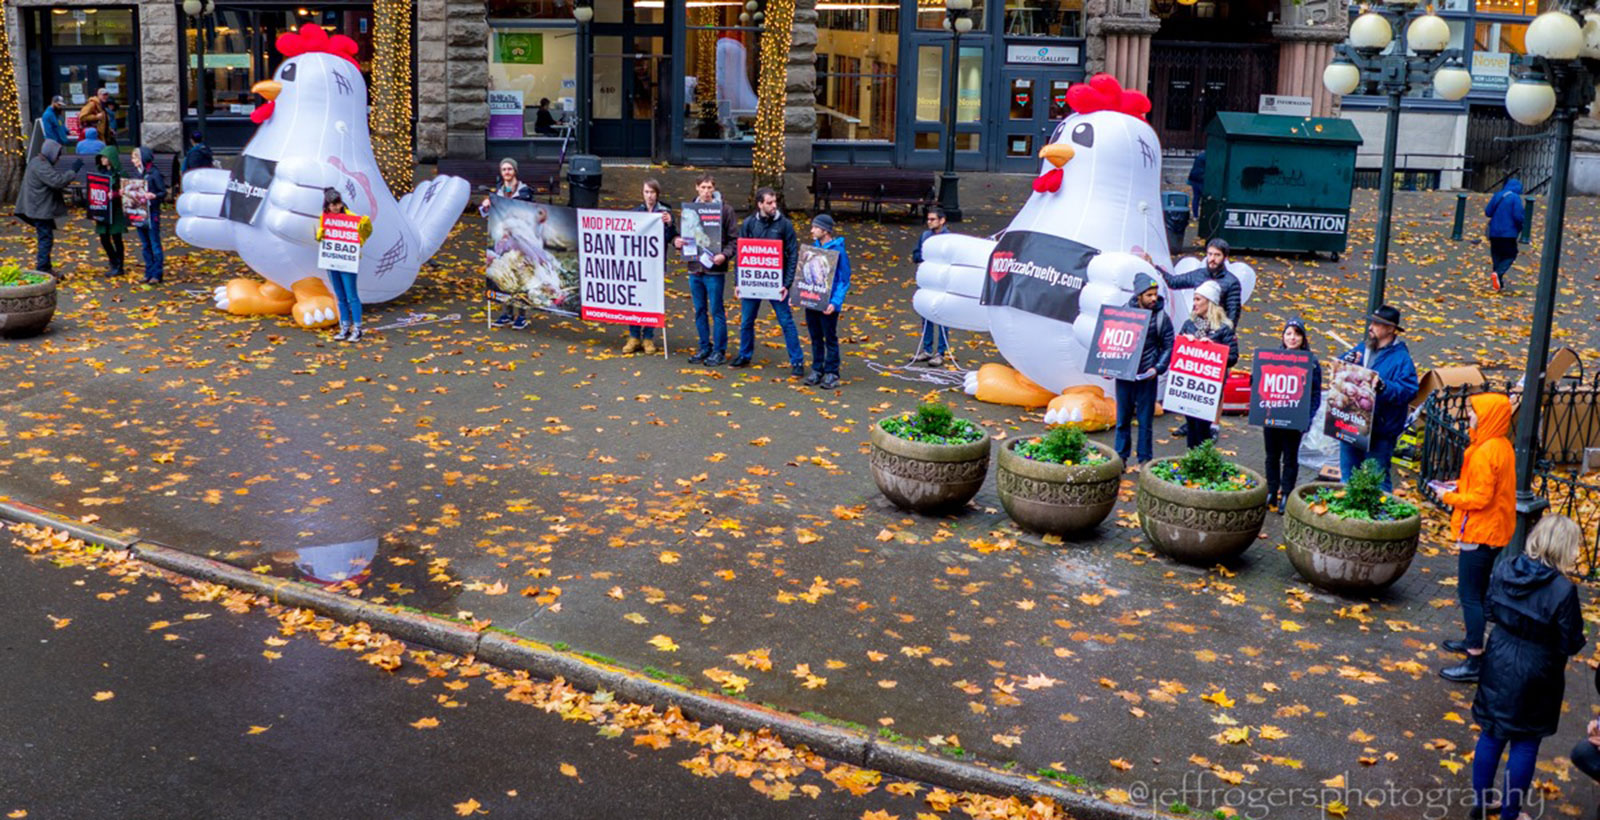 Activists protesting MOD pizza